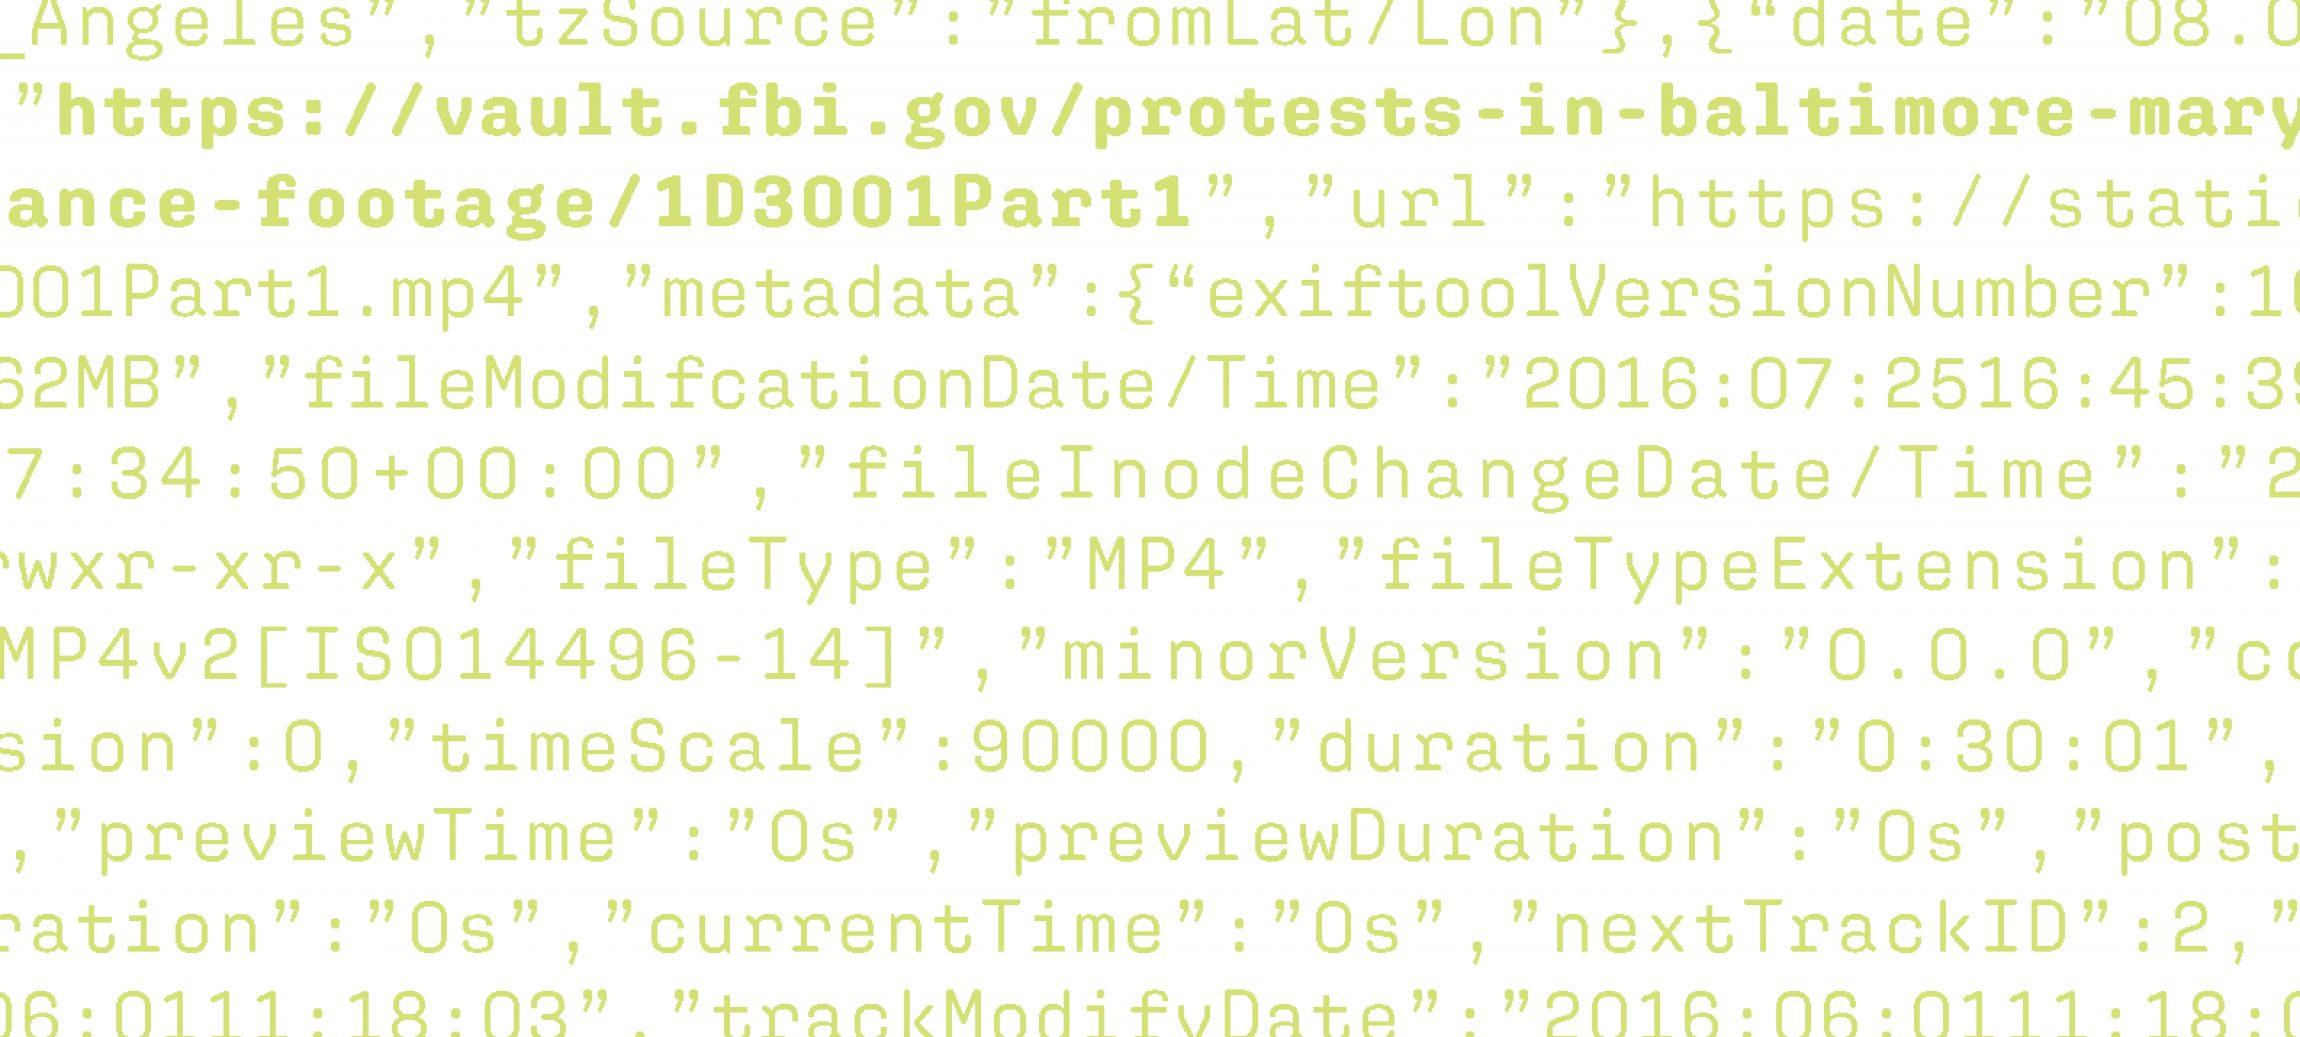 Transforming Surveillance Panel Discussion image